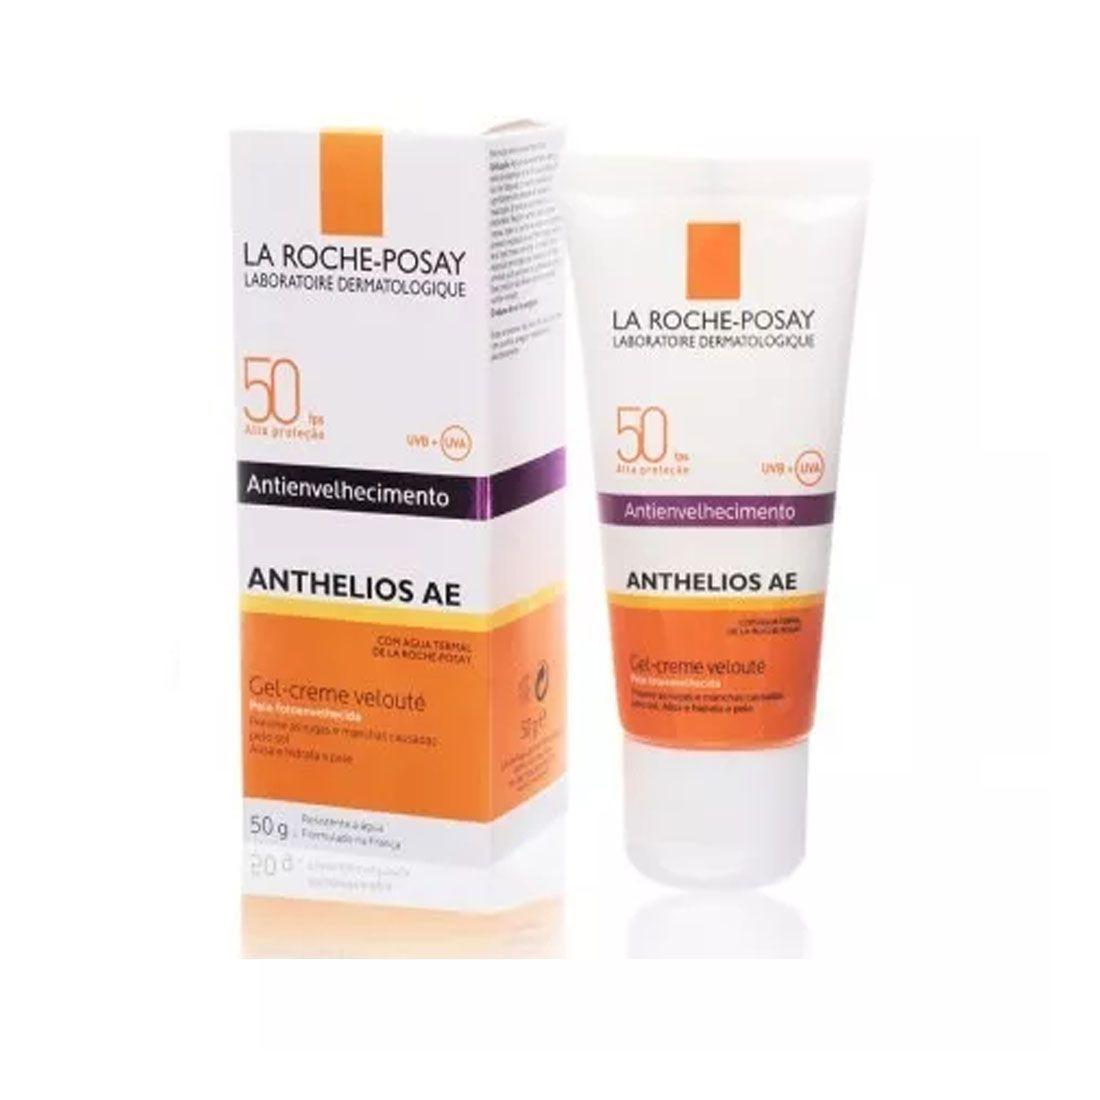 Protetor Solar La Roche-posay Anthelios Ae Gel-creme Fps 50